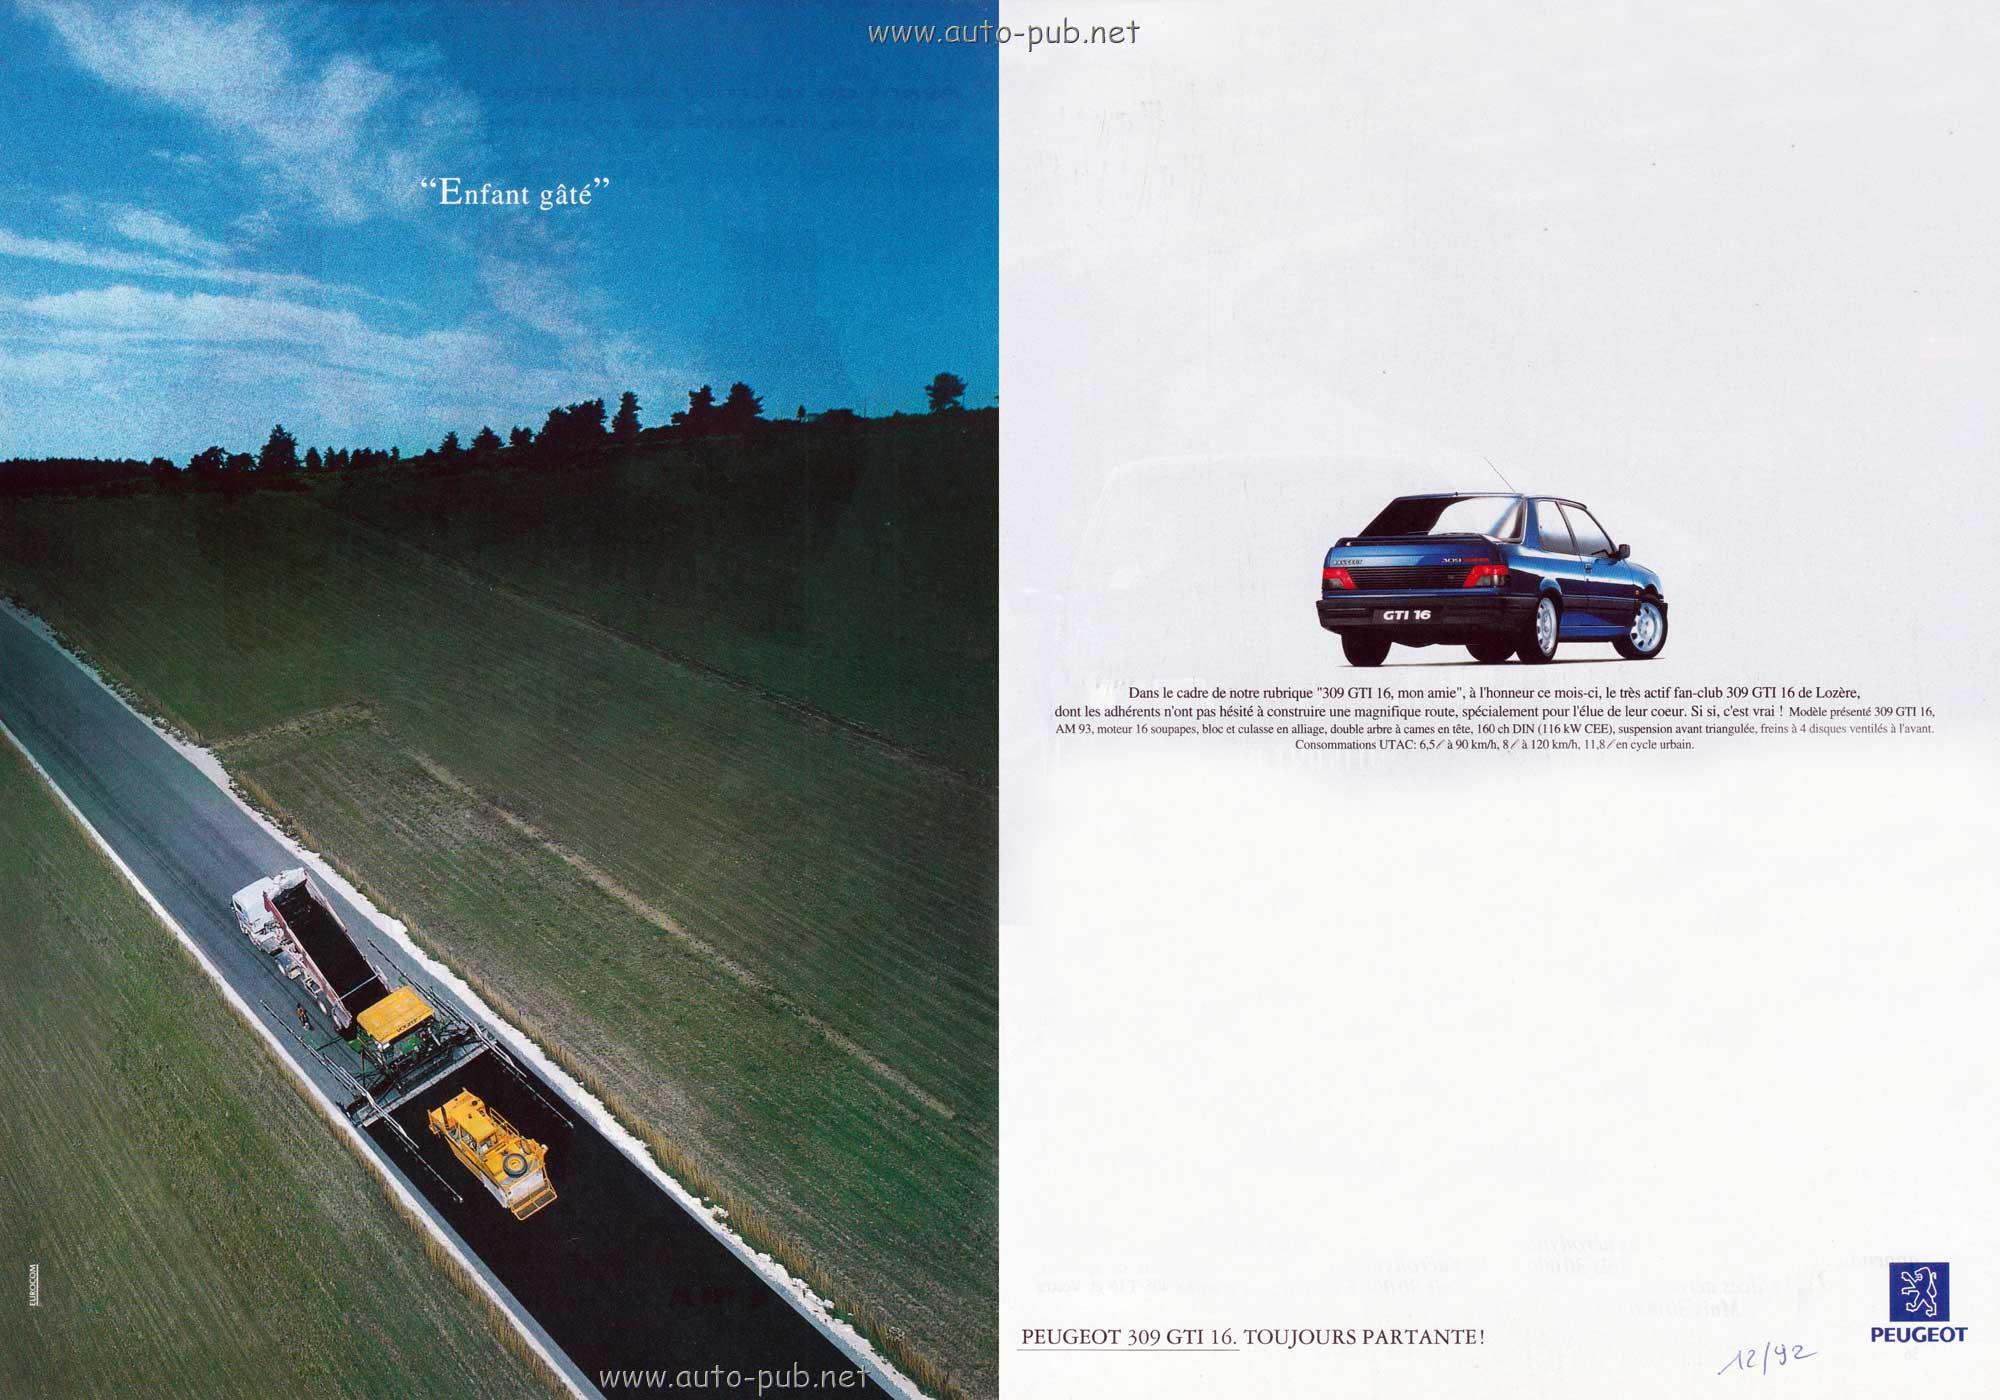 Peugeot 309 GTI 16